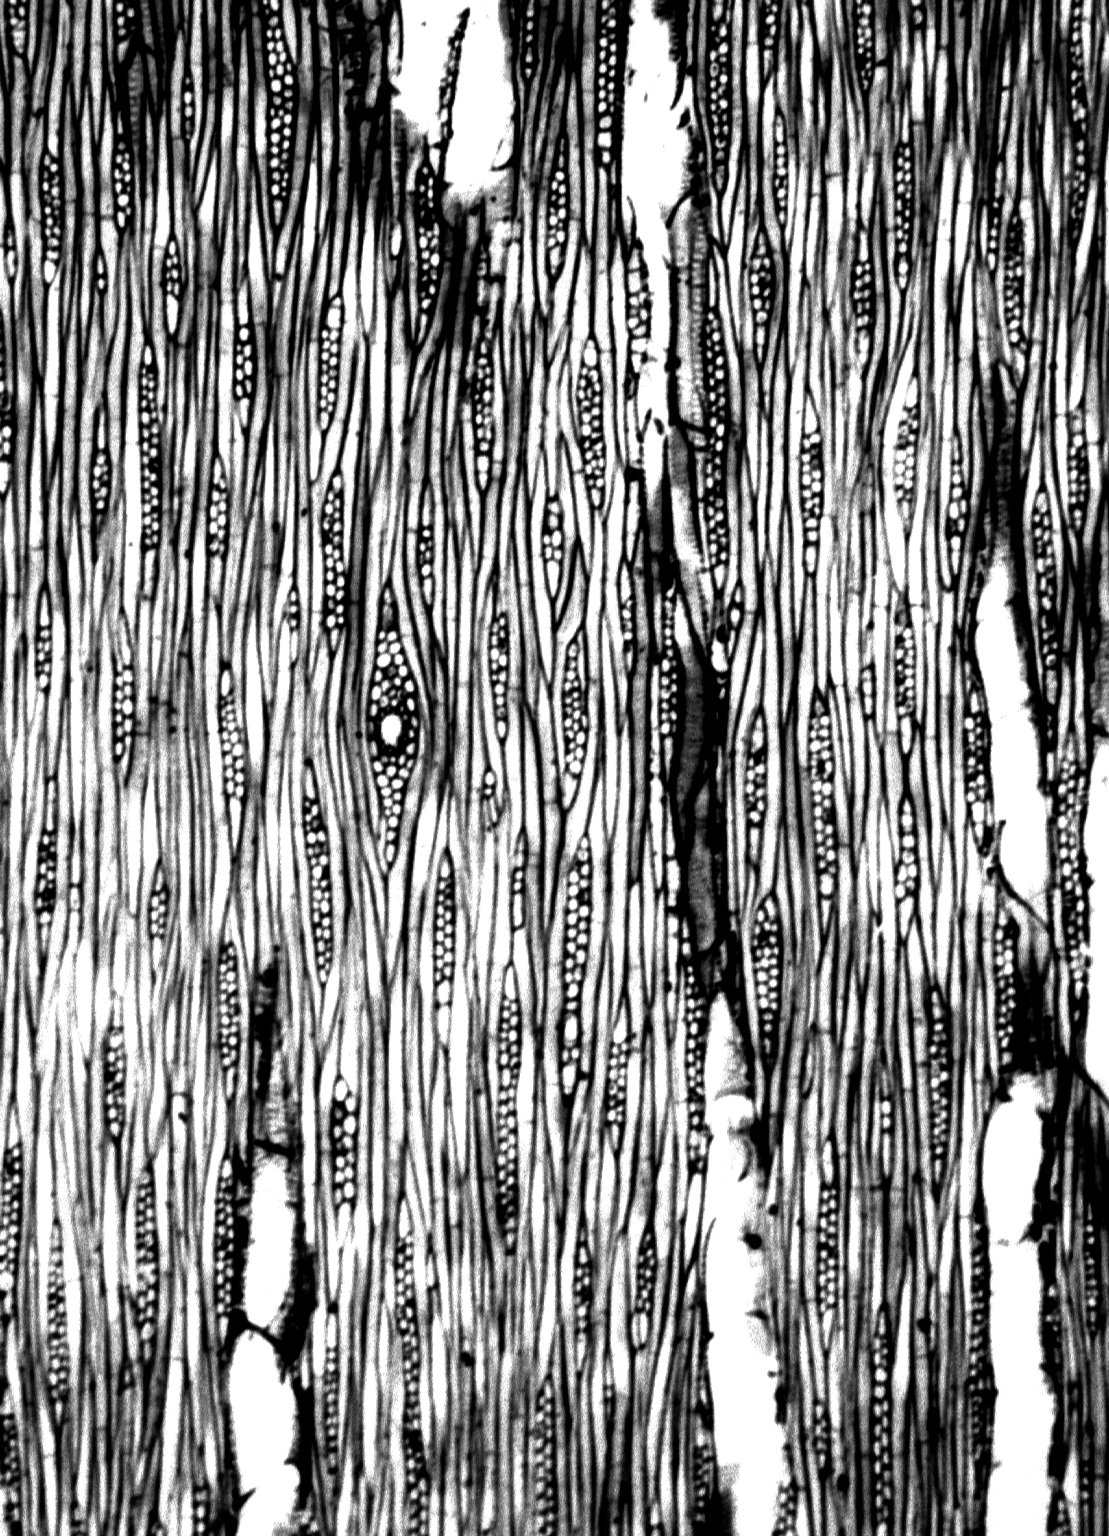 ANACARDIACEAE Buchanania engleriana